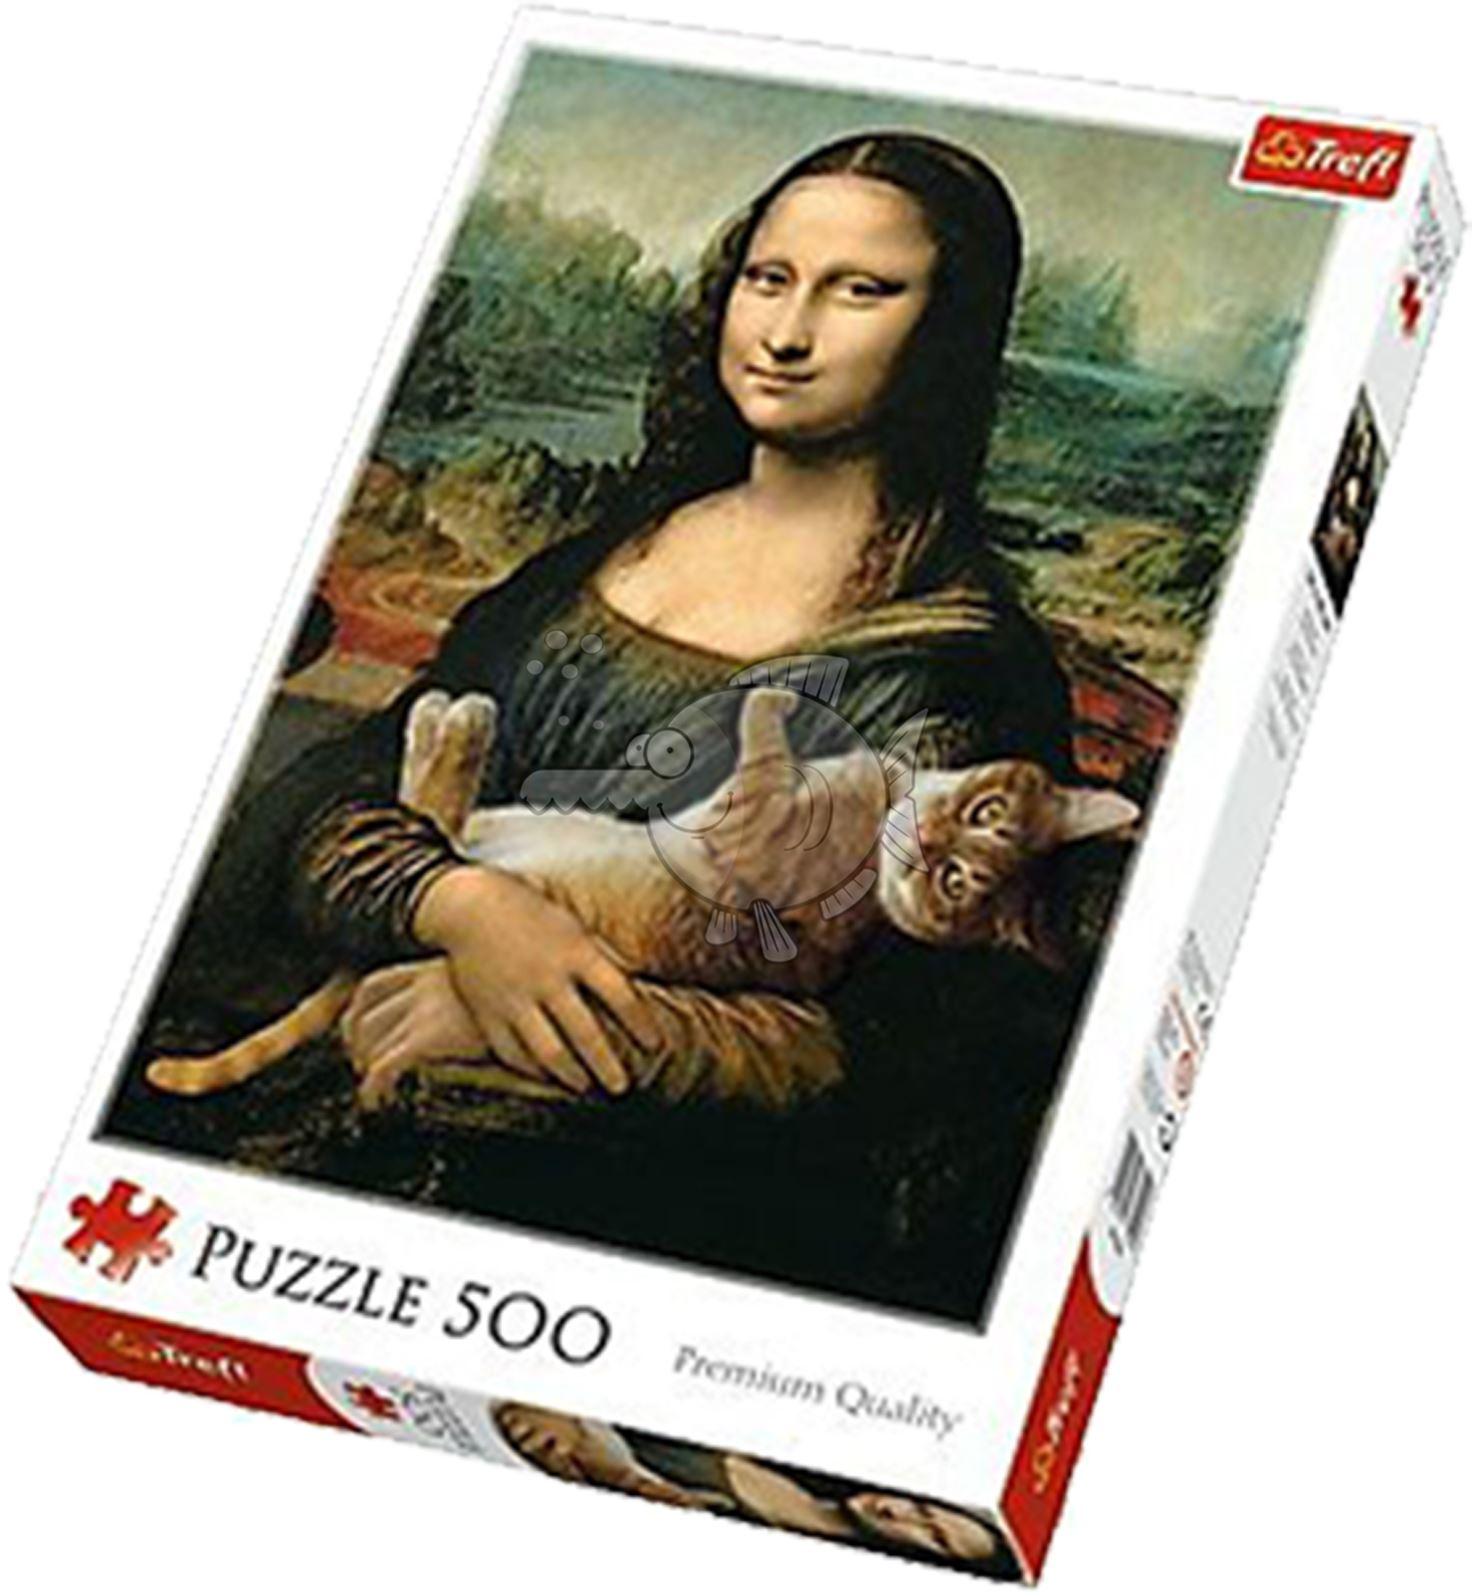 Trefl-300-500-1000-1500-2000-3000-4000-6000-Piece-Jigsaw-Puzzle-Landscapes-City thumbnail 225